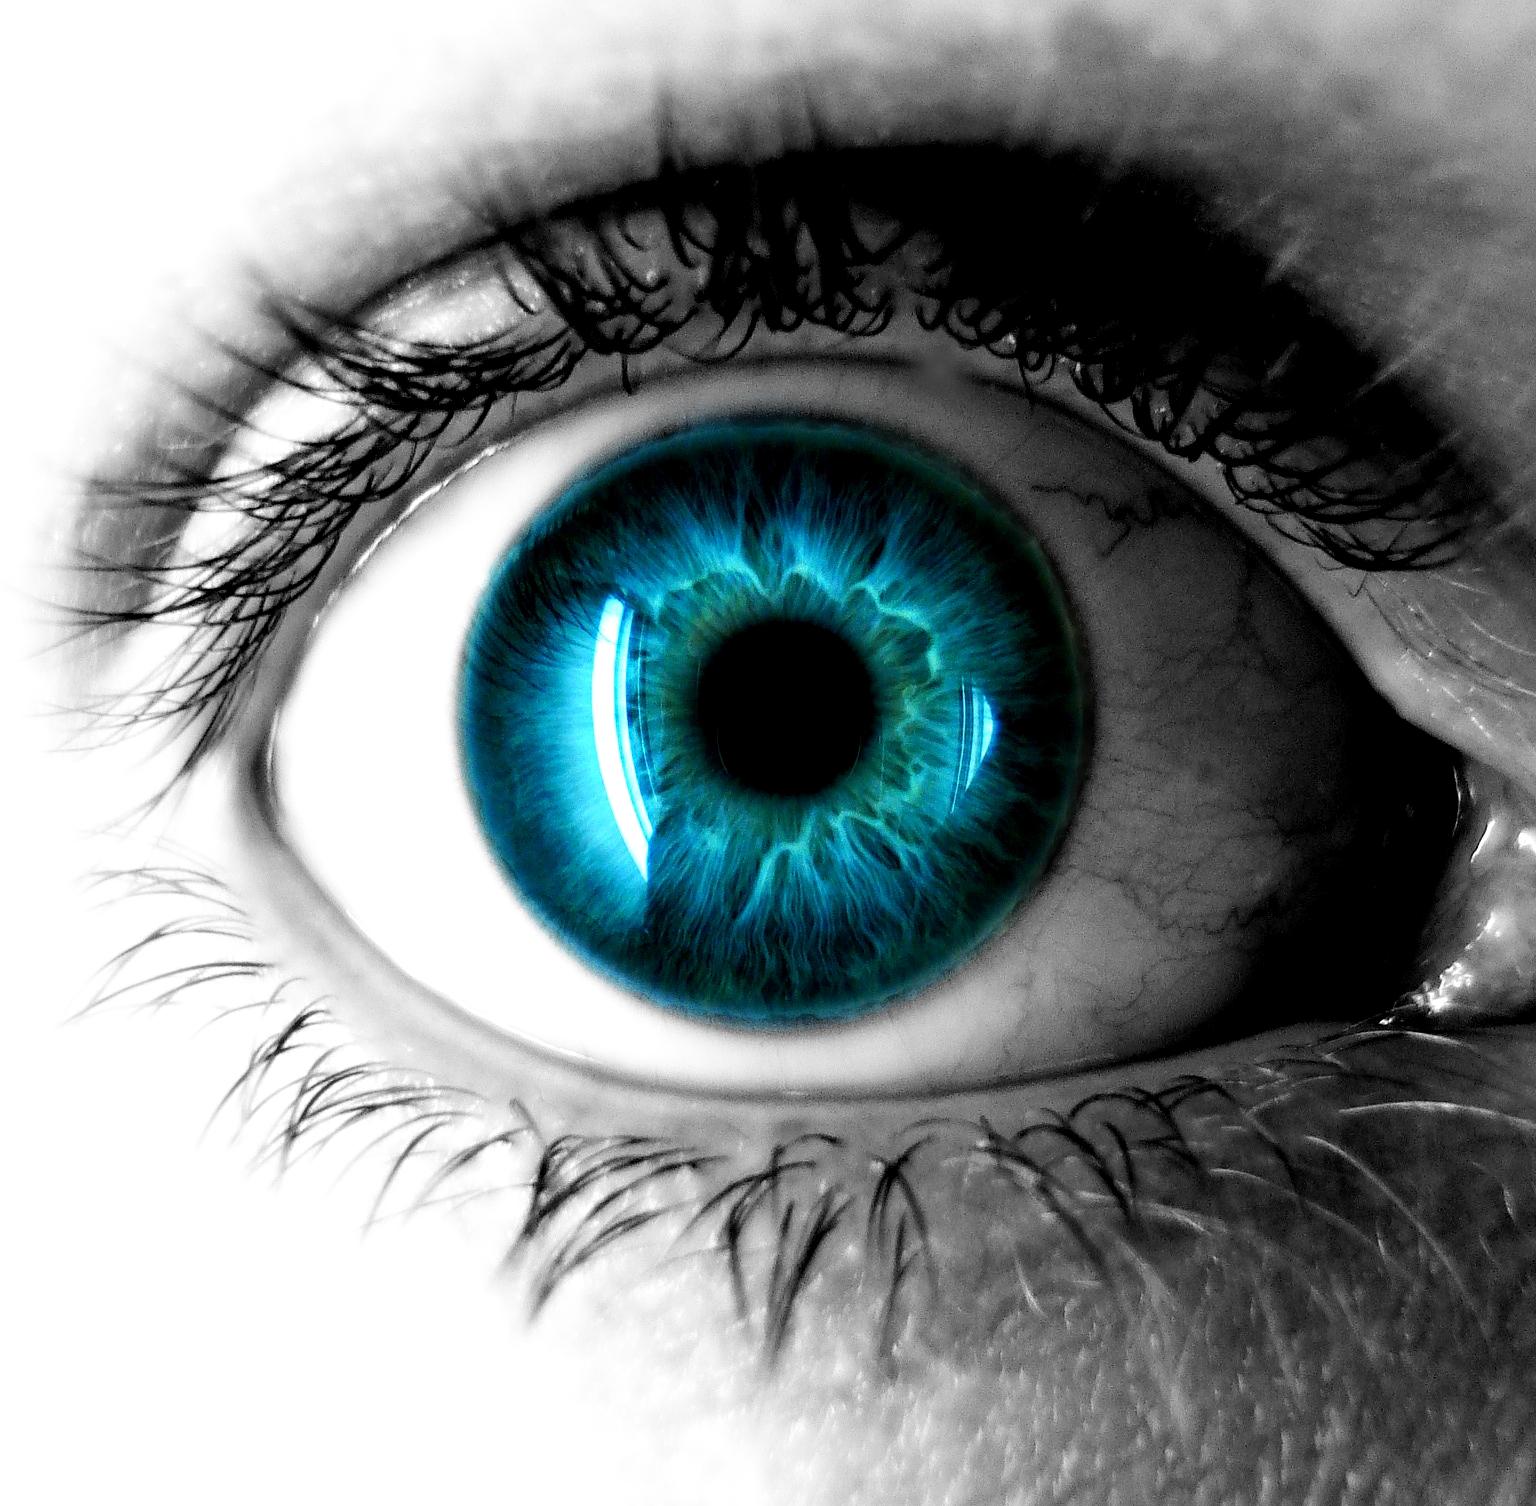 Eye Computer Wallpapers Desktop Backgrounds 1536x1506 ID80944 1536x1506